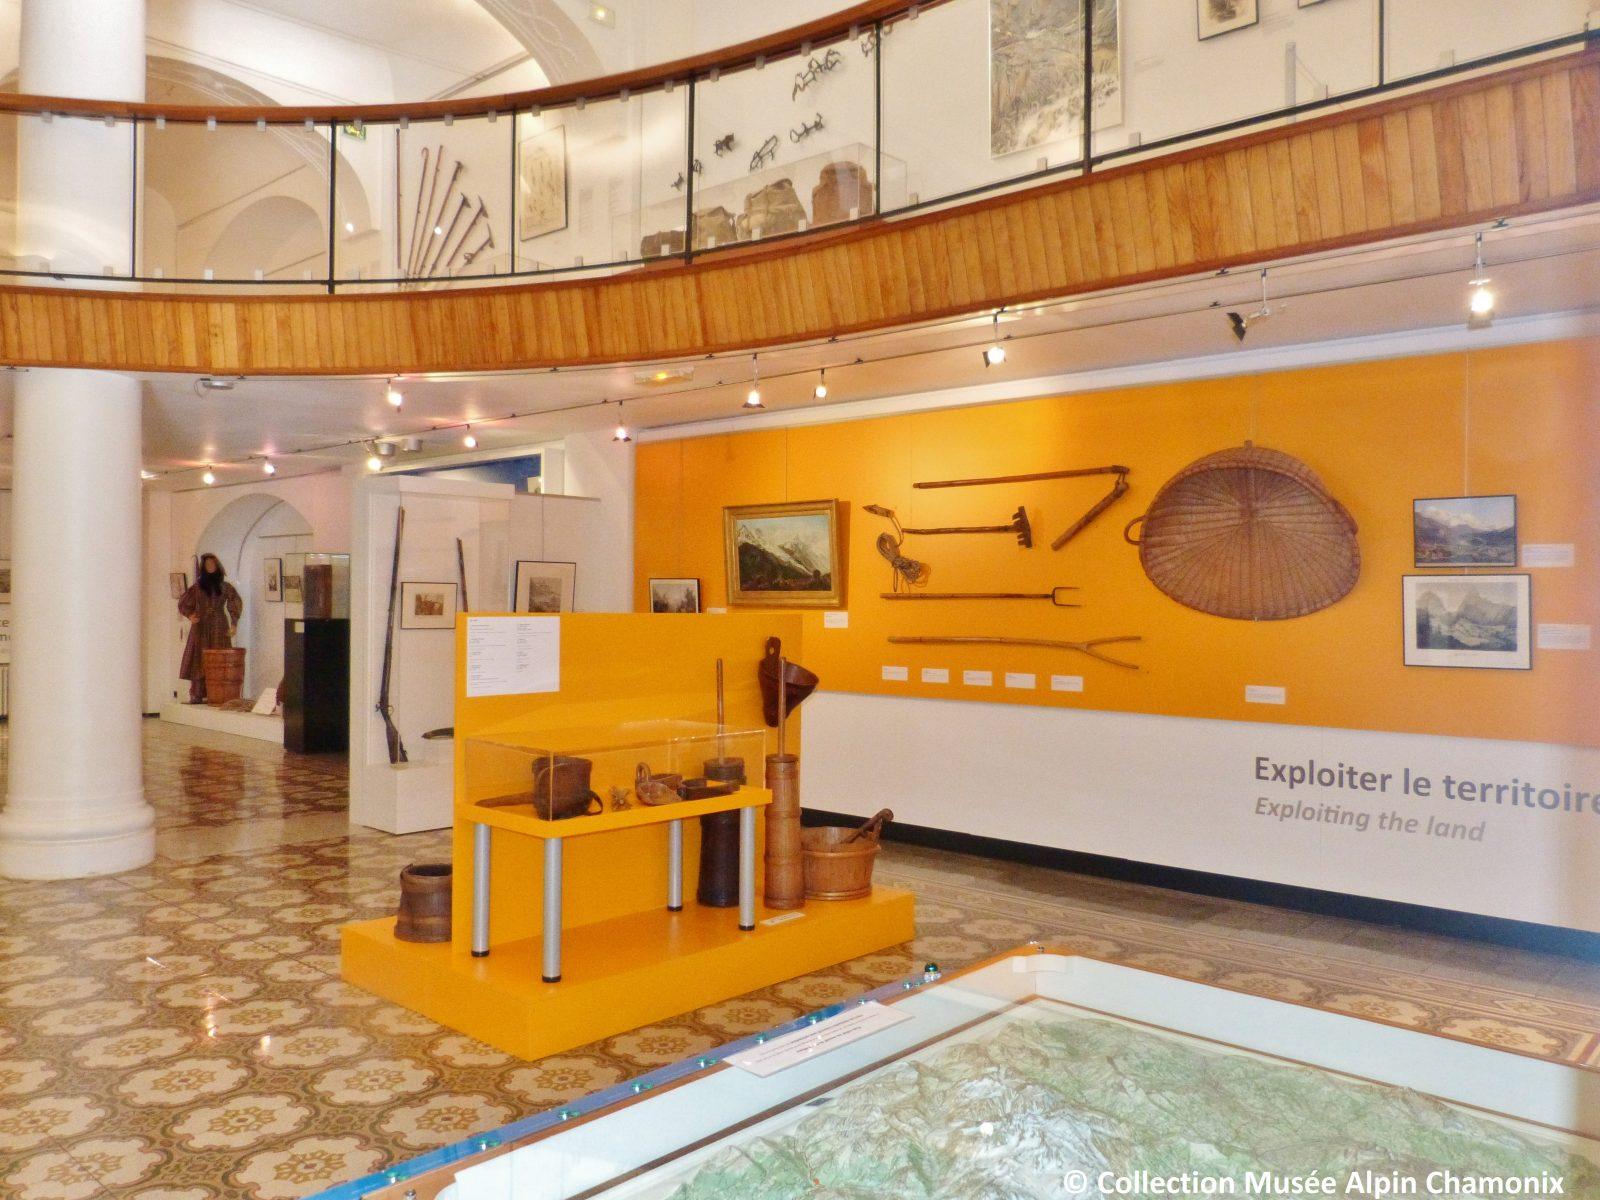 Musée Alpin Chamonix – salle repères exploiter territoire